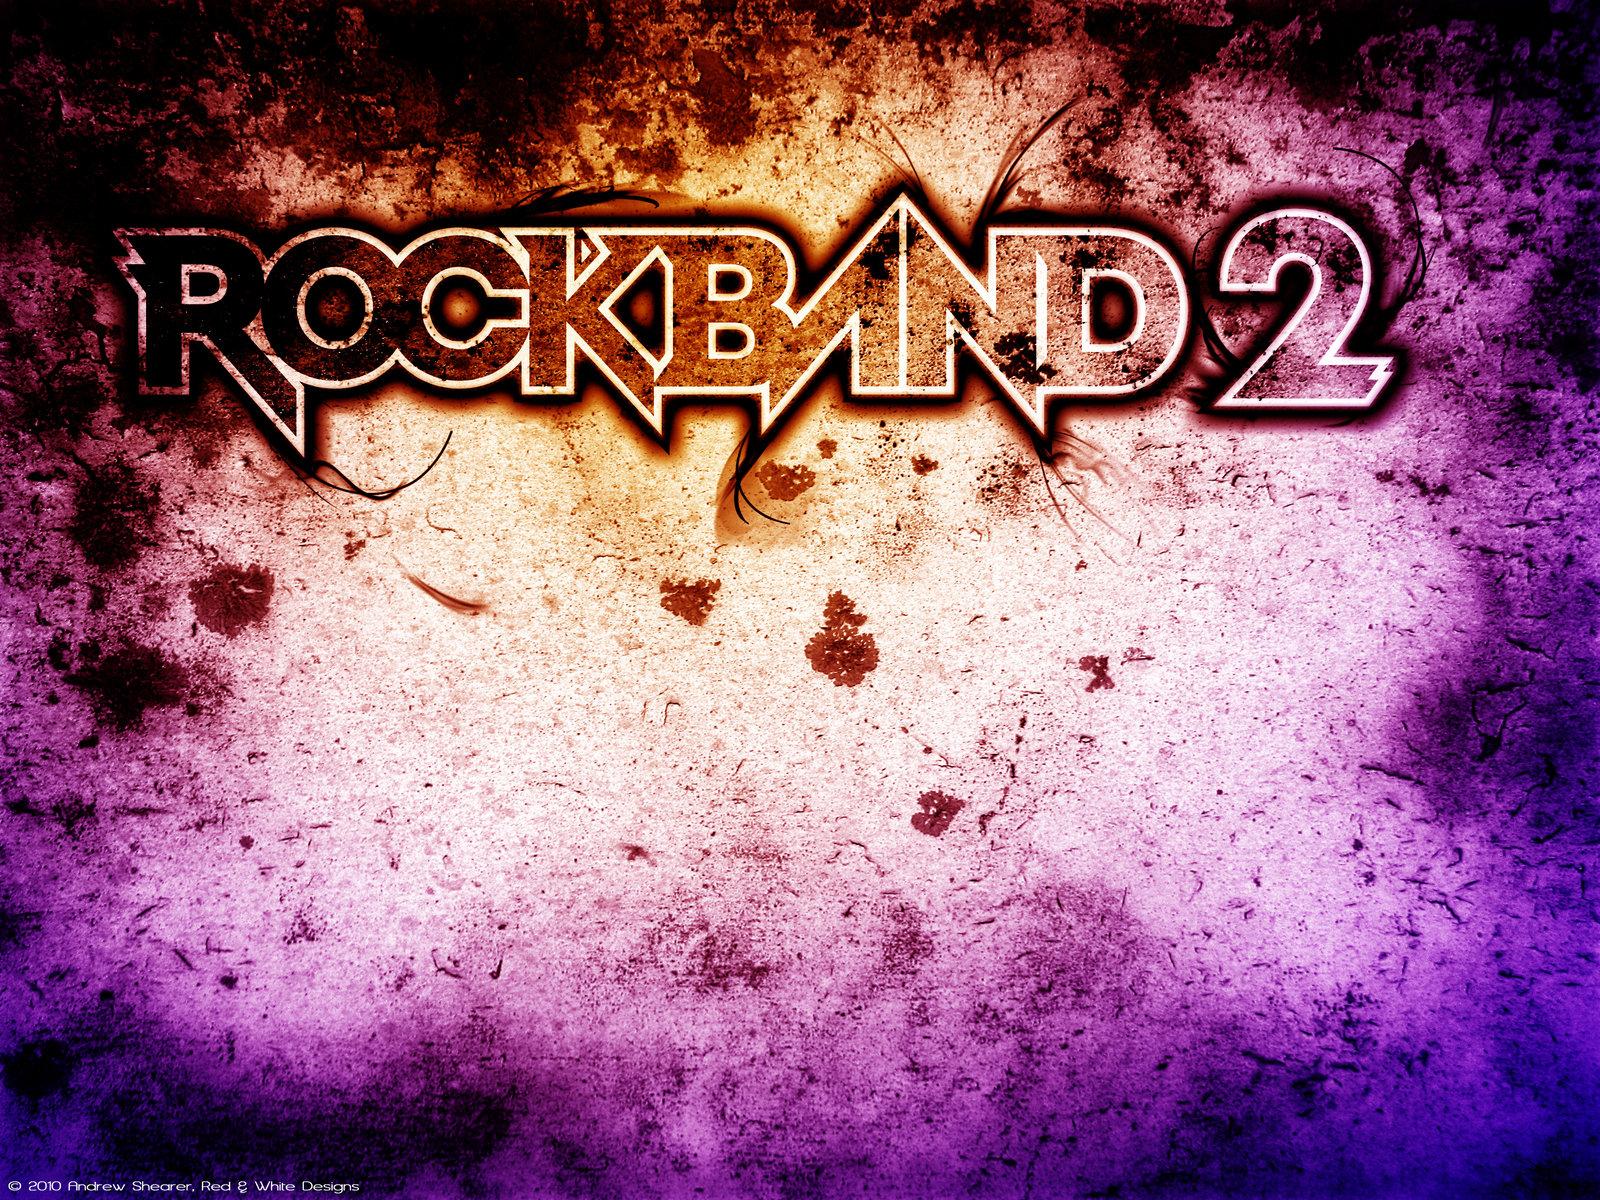 Rock Band 2 Wallpaper by RedAndWhiteDesigns on DeviantArt